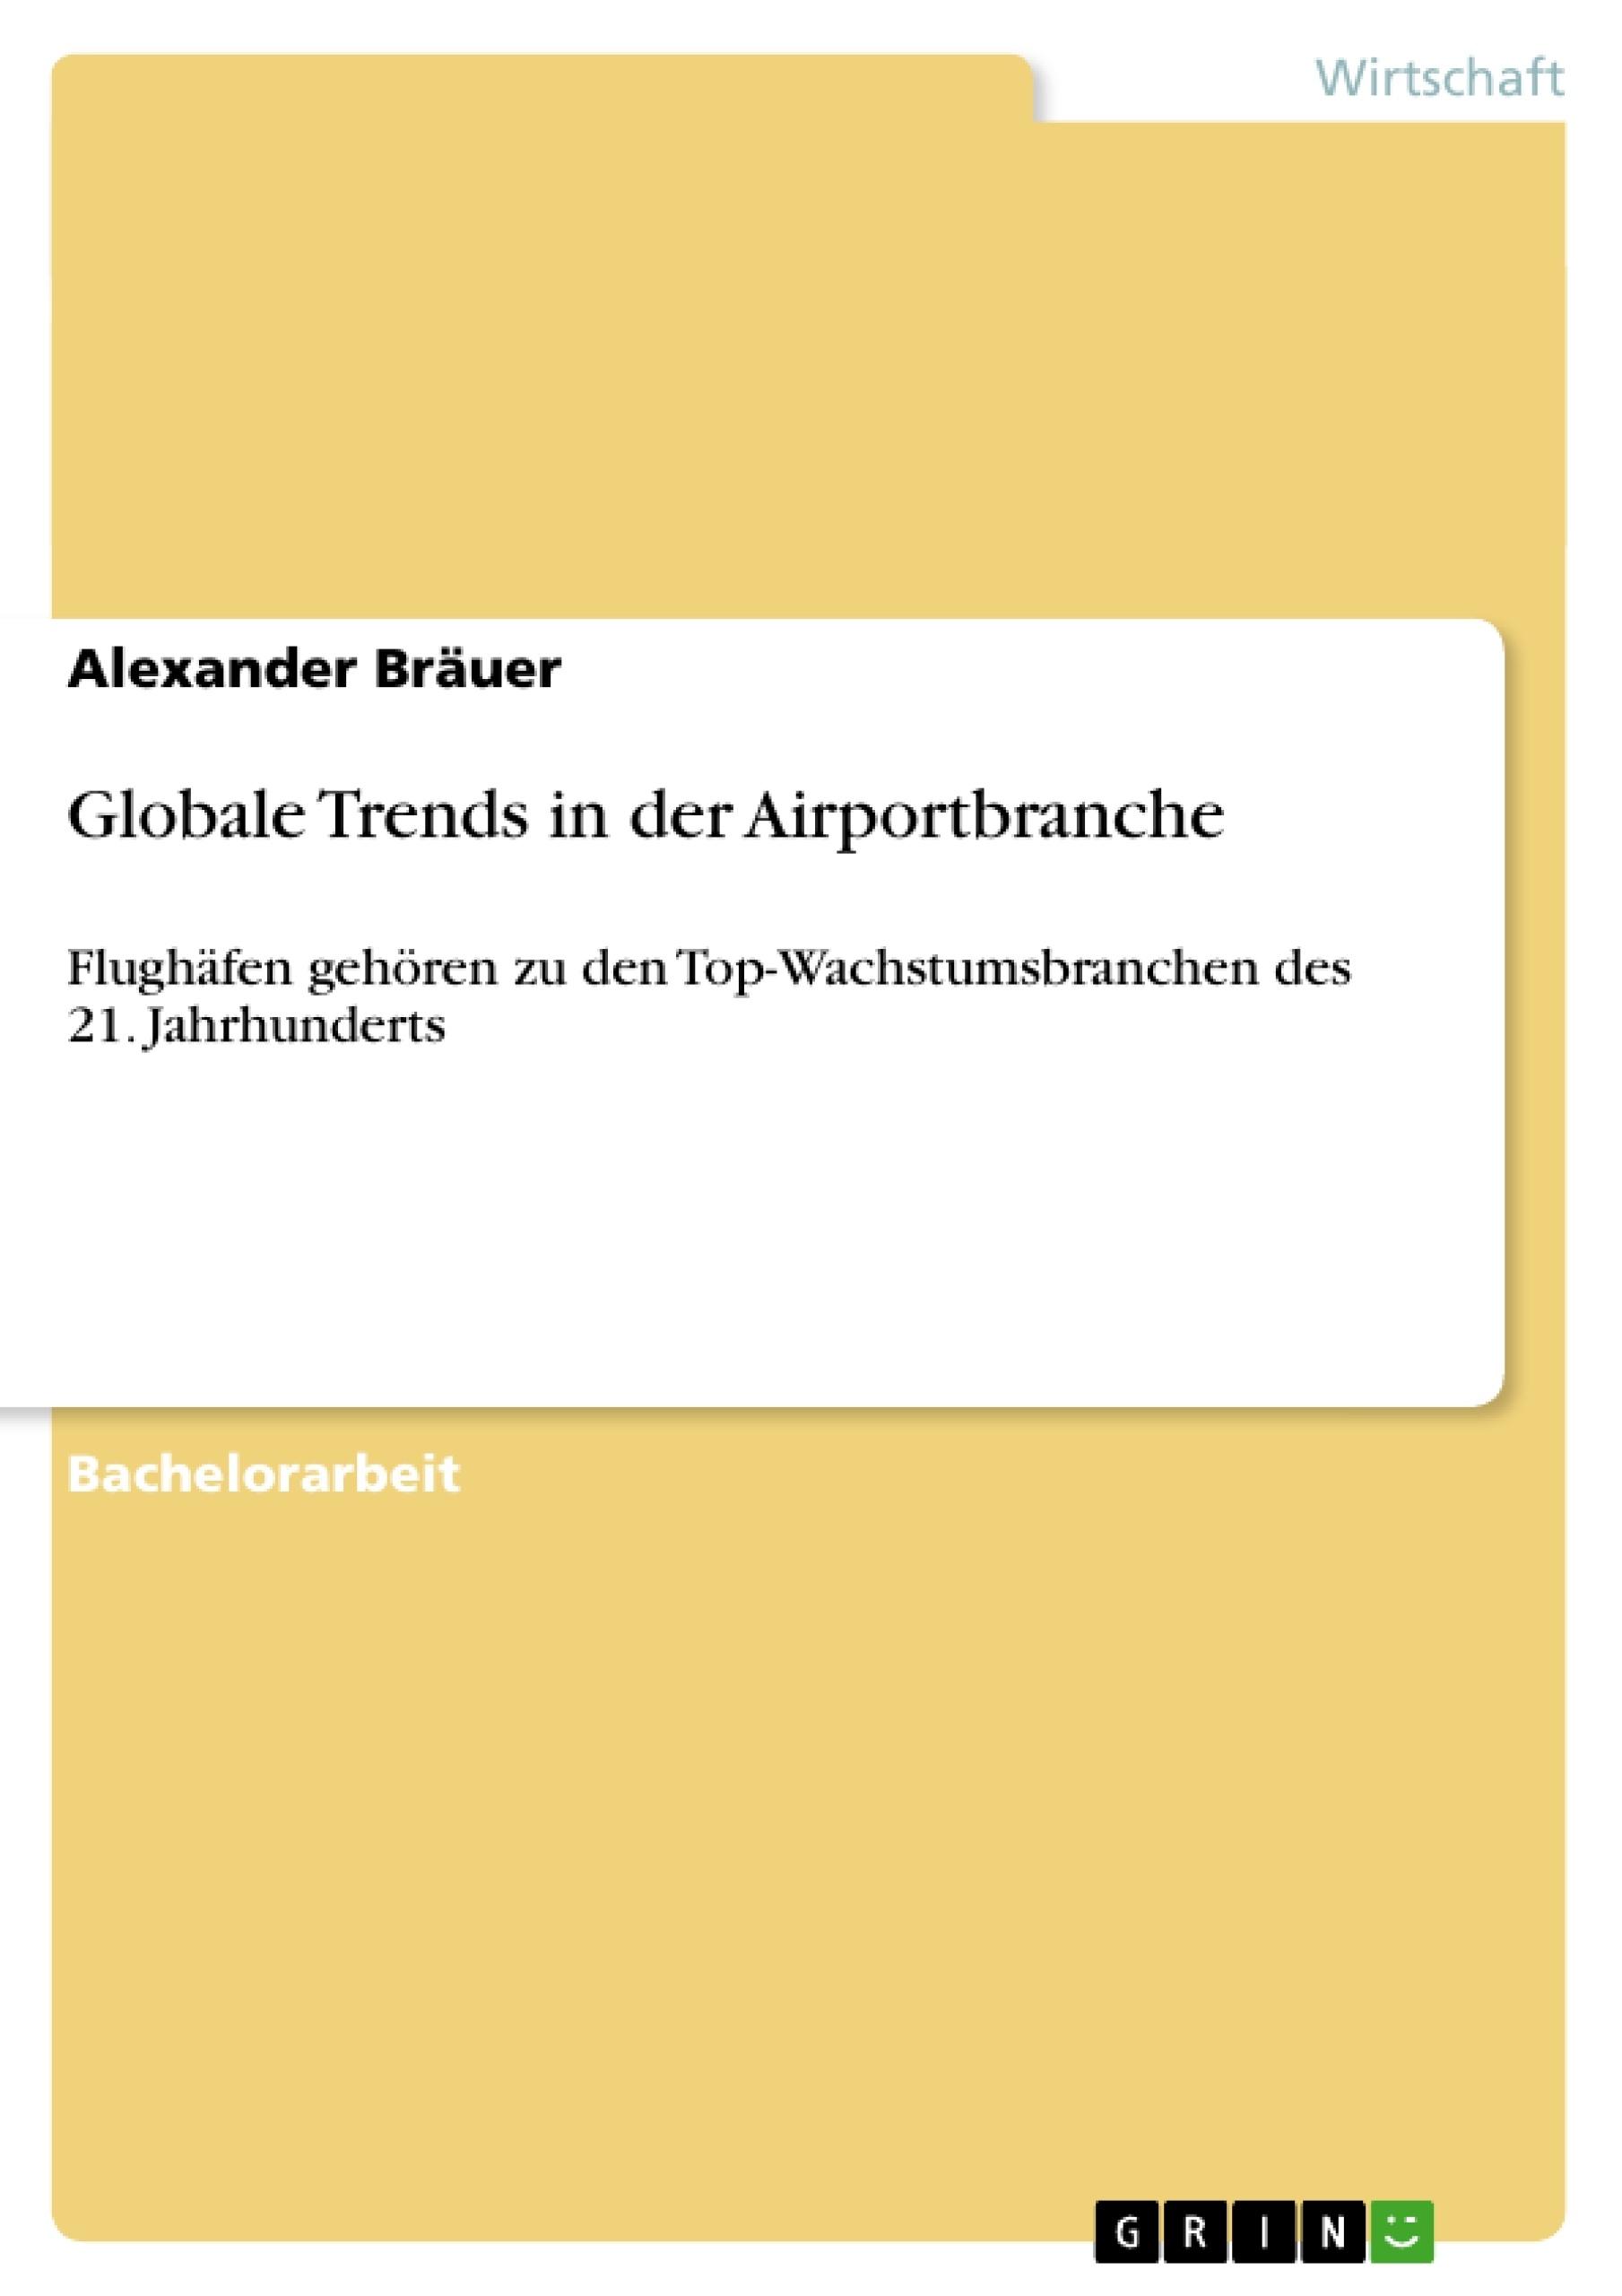 Globale Trends in der Airportbranche | Masterarbeit, Hausarbeit ...